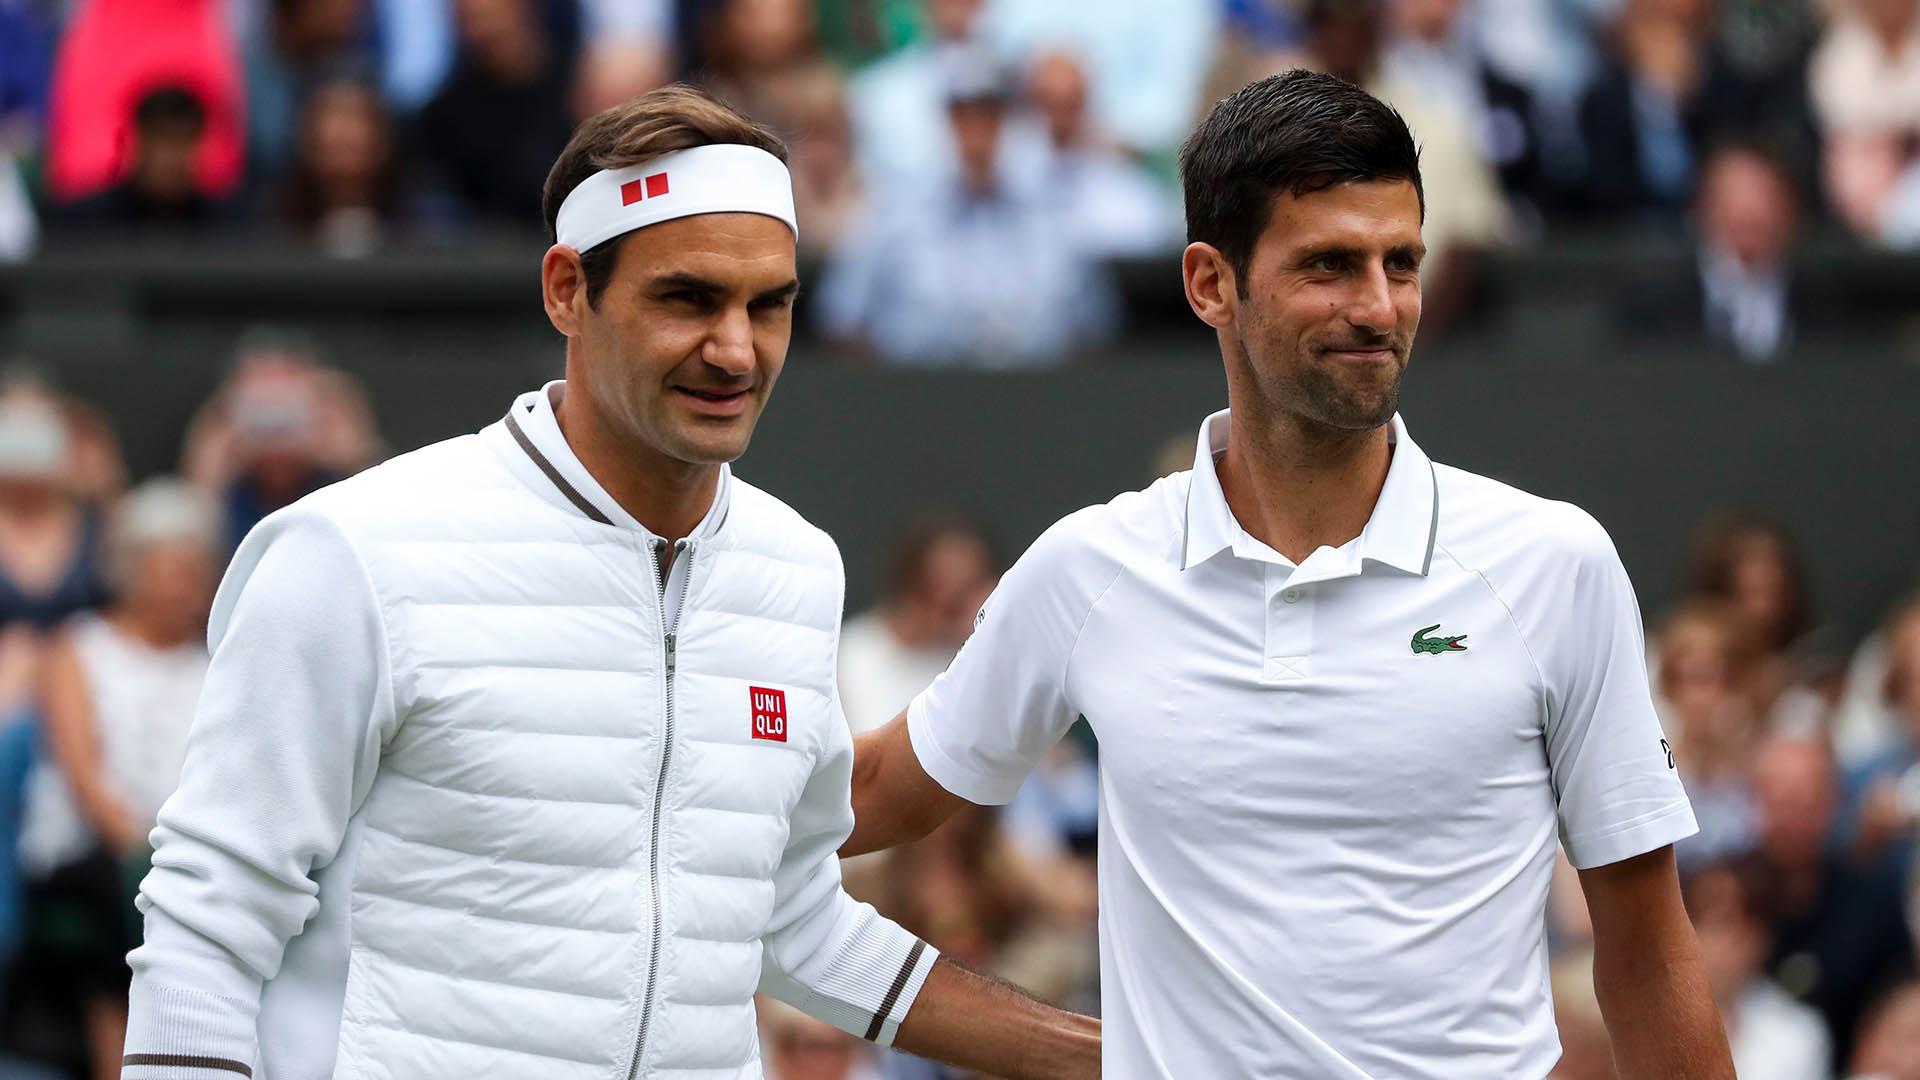 Djokovic venció a Roger Federer por 7-6 (5), 1-6, 7-6 (4), 4-6 y 13-12 (Shutterstock)